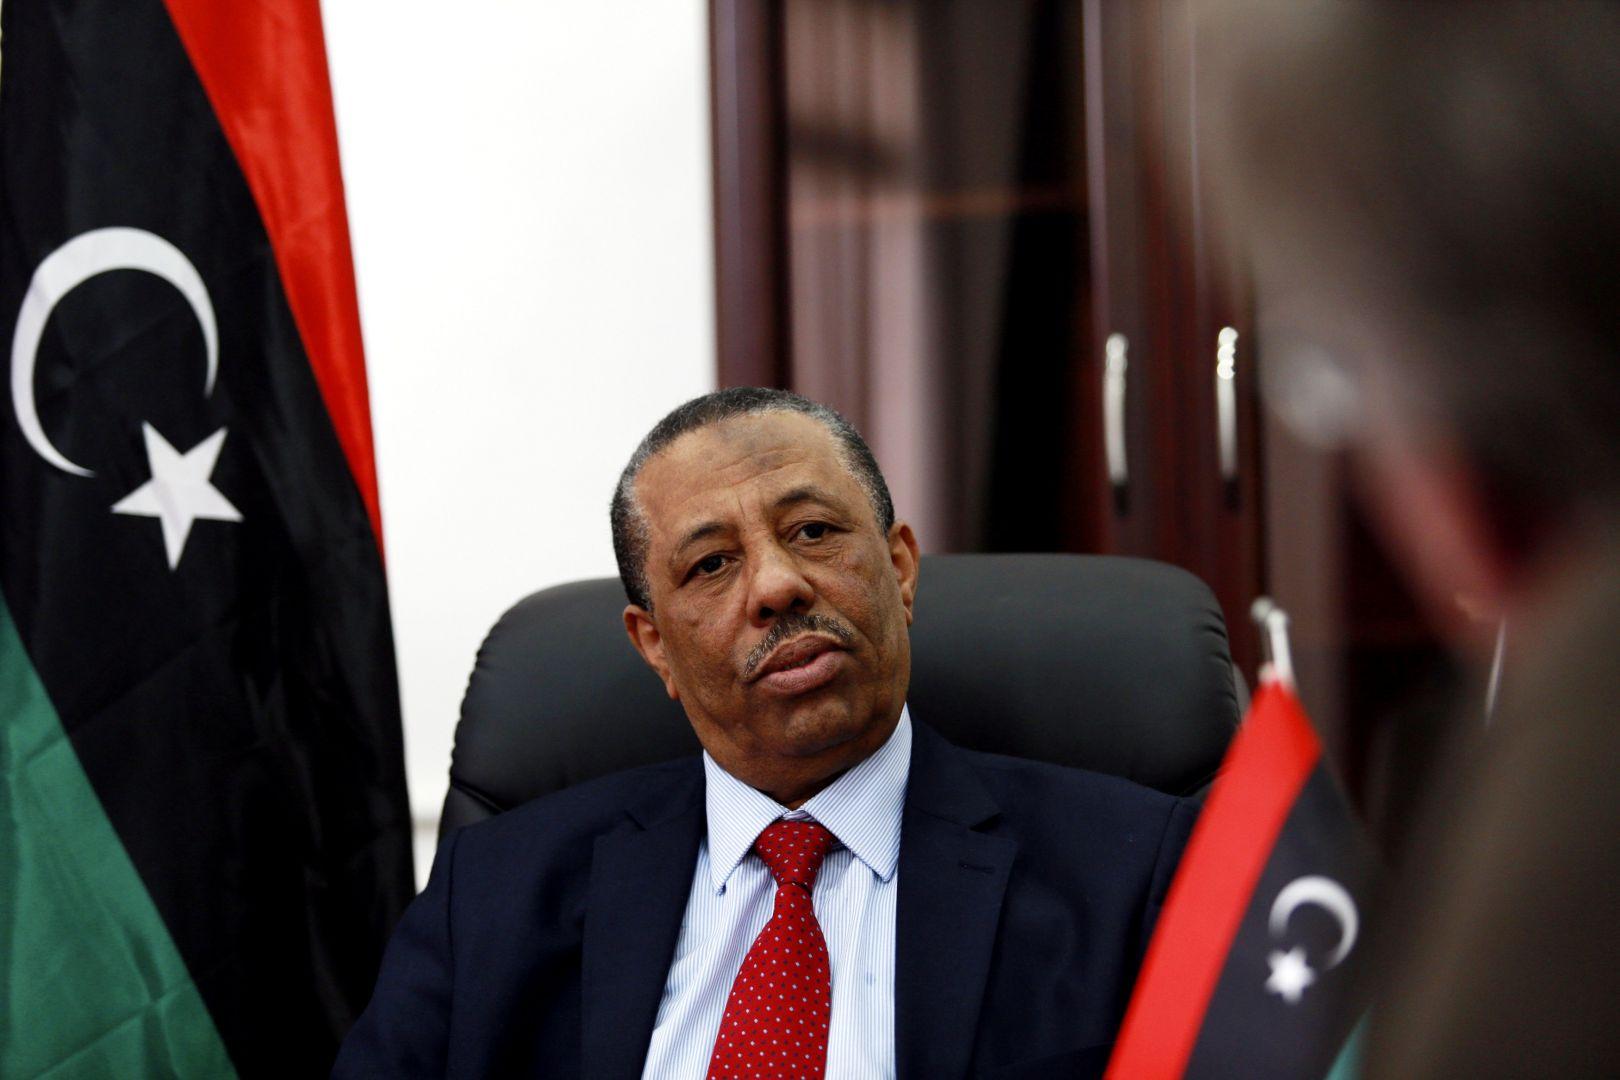 libia al thani